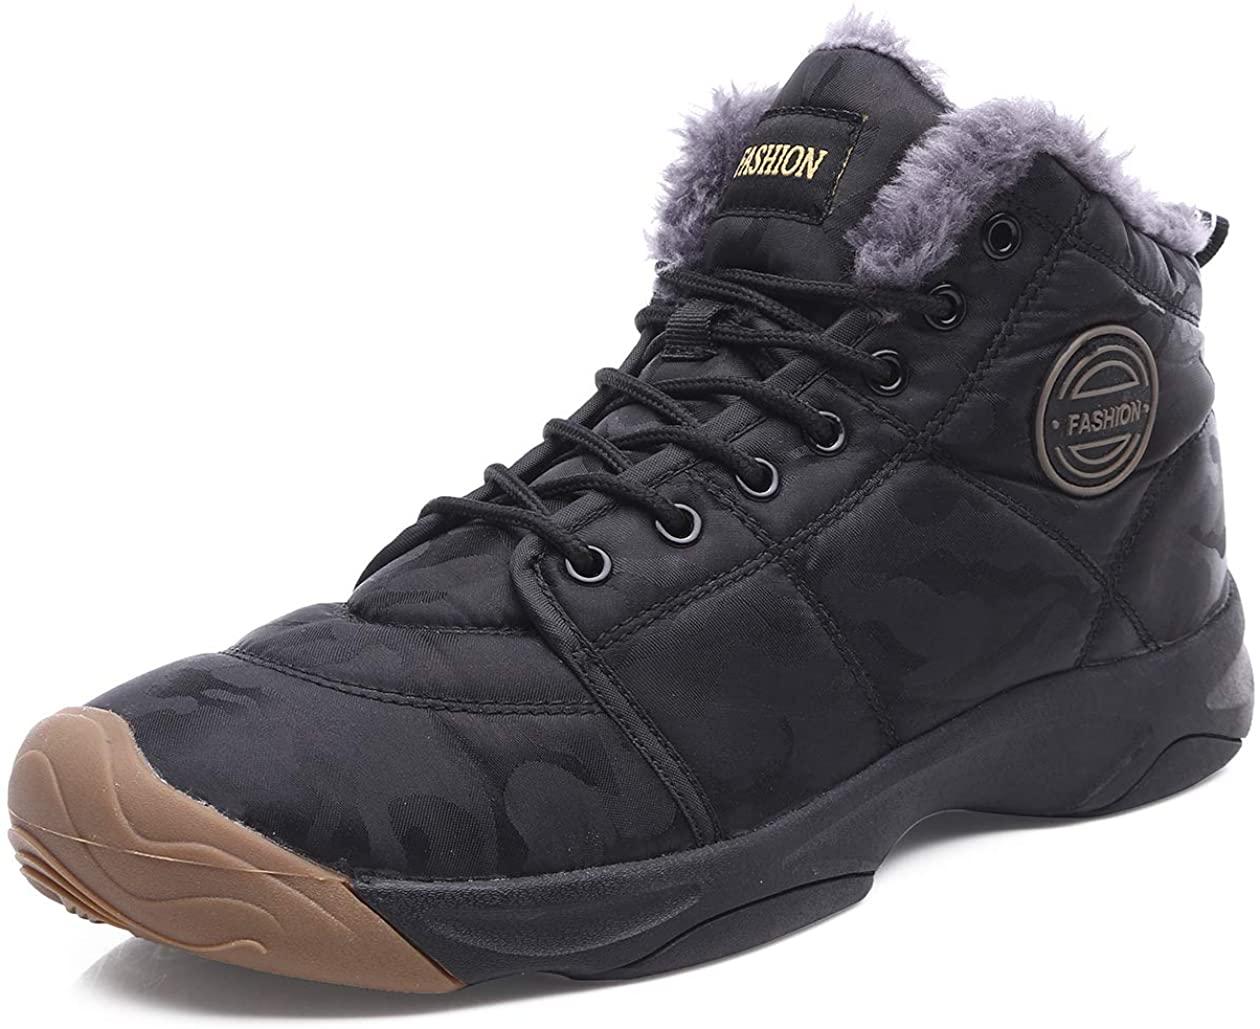 YIRUIYA Mens Snow Boots Waterproof Winter Boots Anti-Slip Sneakers